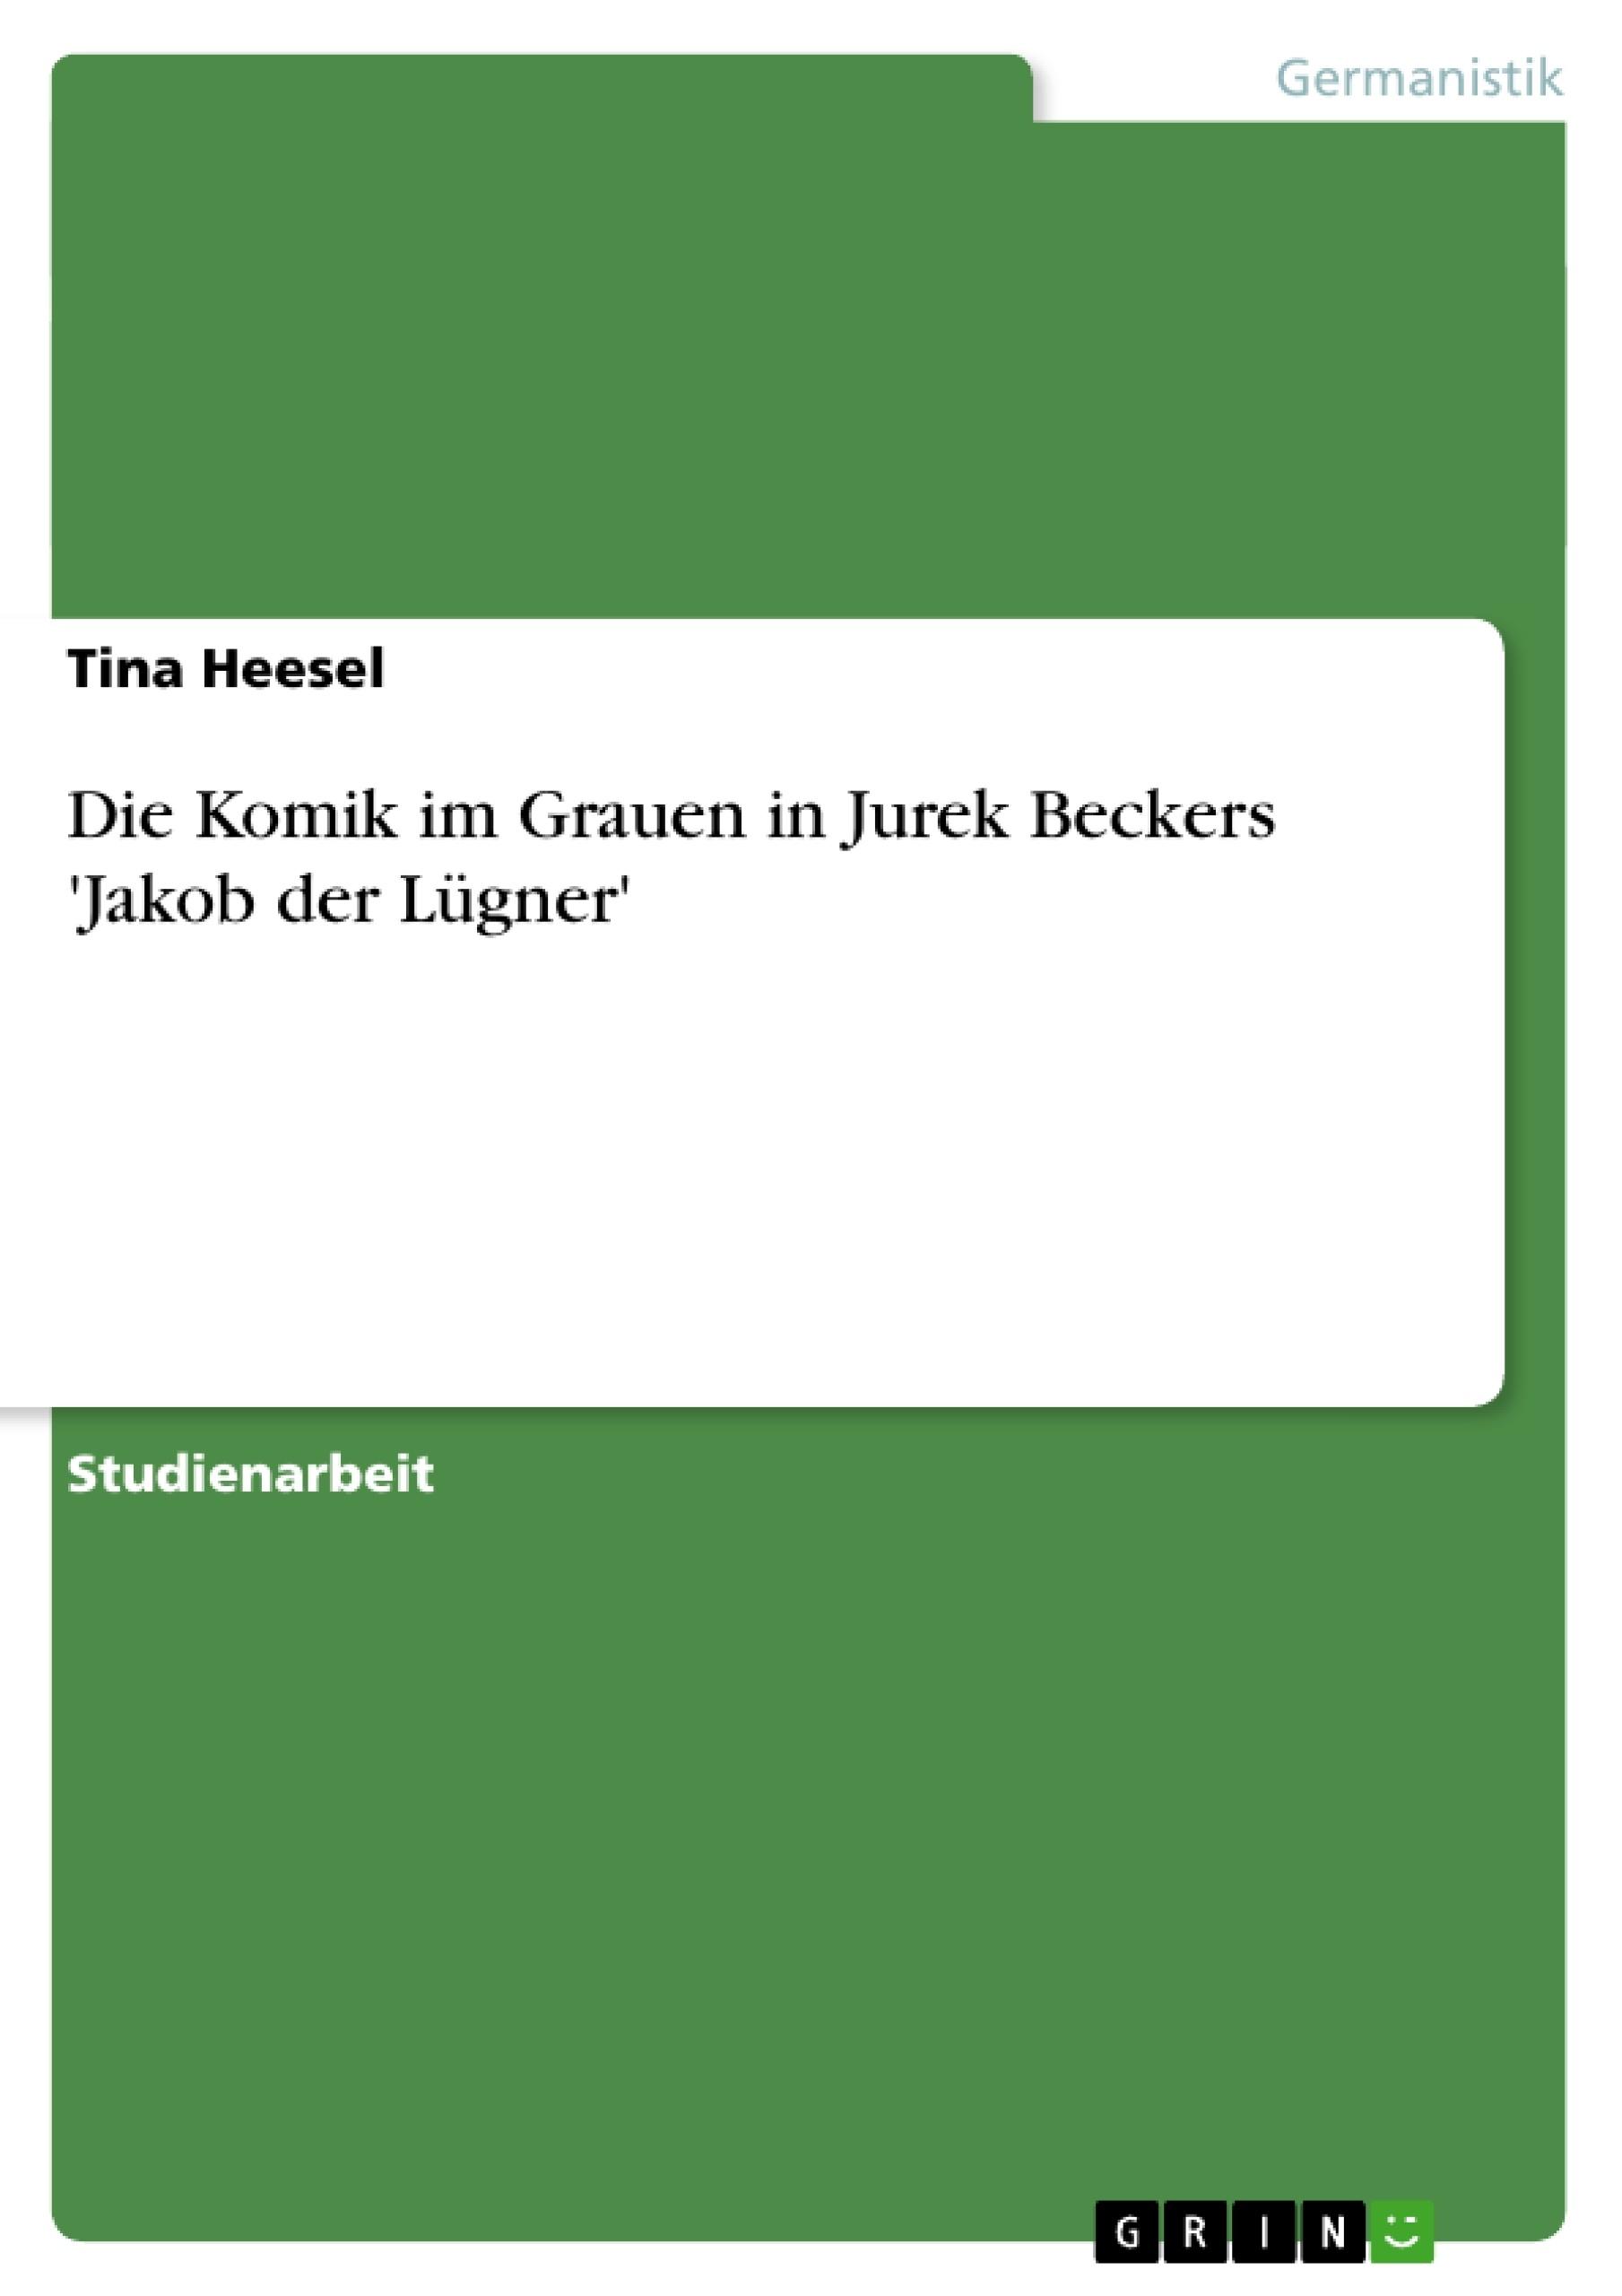 Titel: Die Komik im Grauen in Jurek Beckers 'Jakob der Lügner'